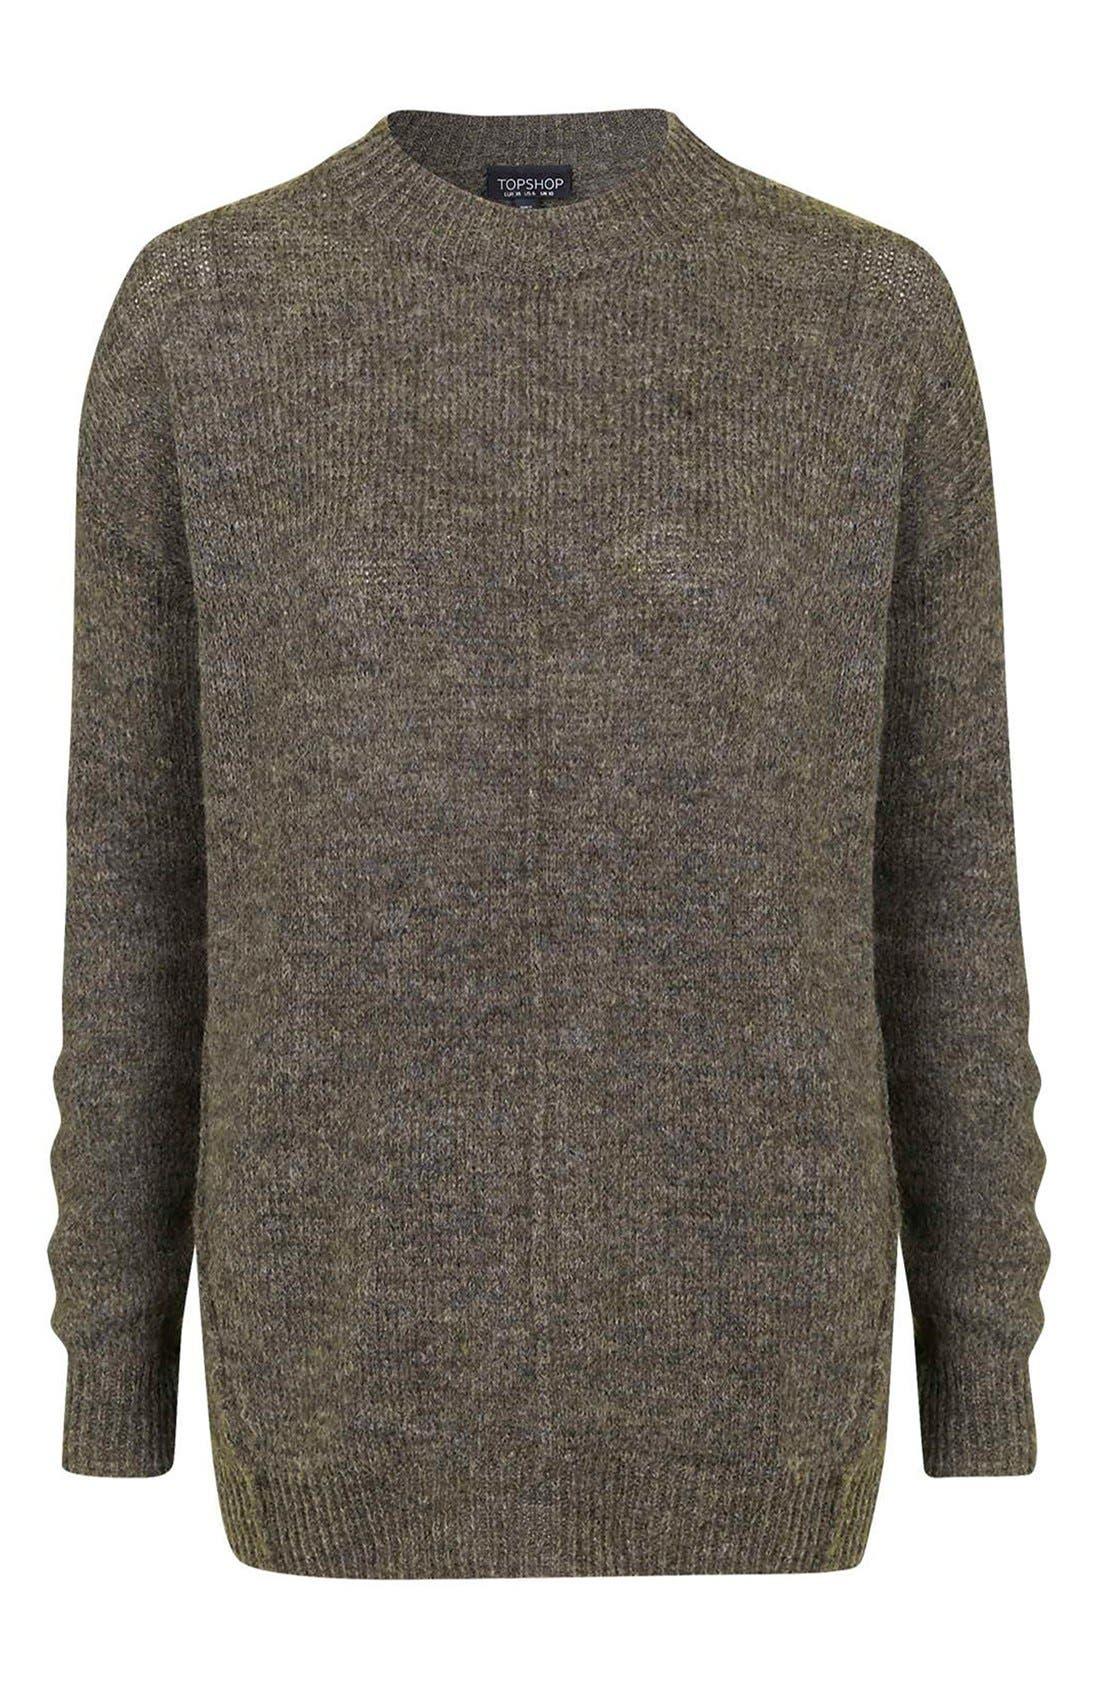 Alternate Image 3  - Topshop Longline Pullover Sweater